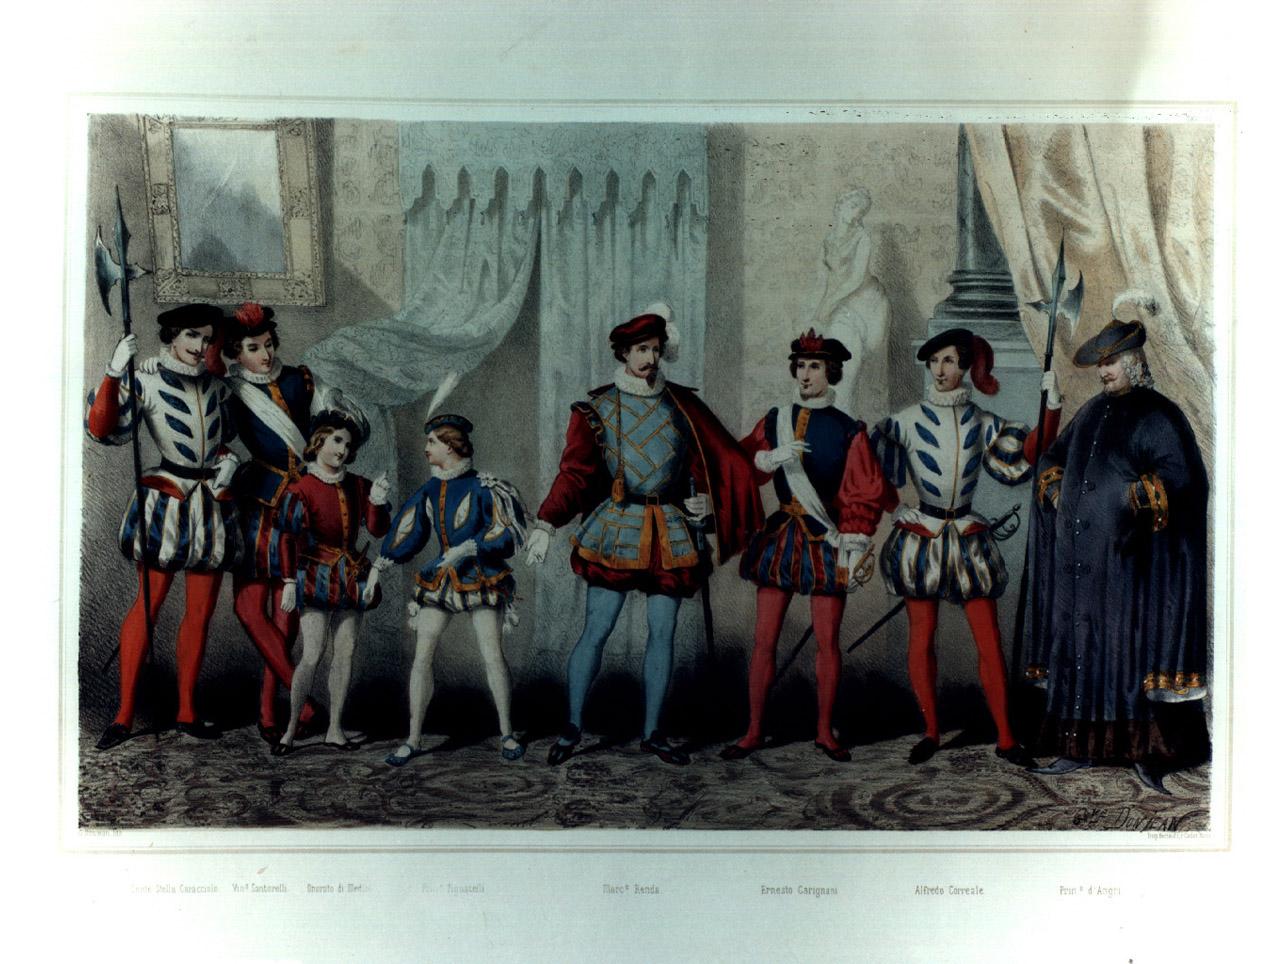 figure maschili in costume entro salone (stampa a colori, elemento d'insieme) di Donjean Gustave (sec. XIX)